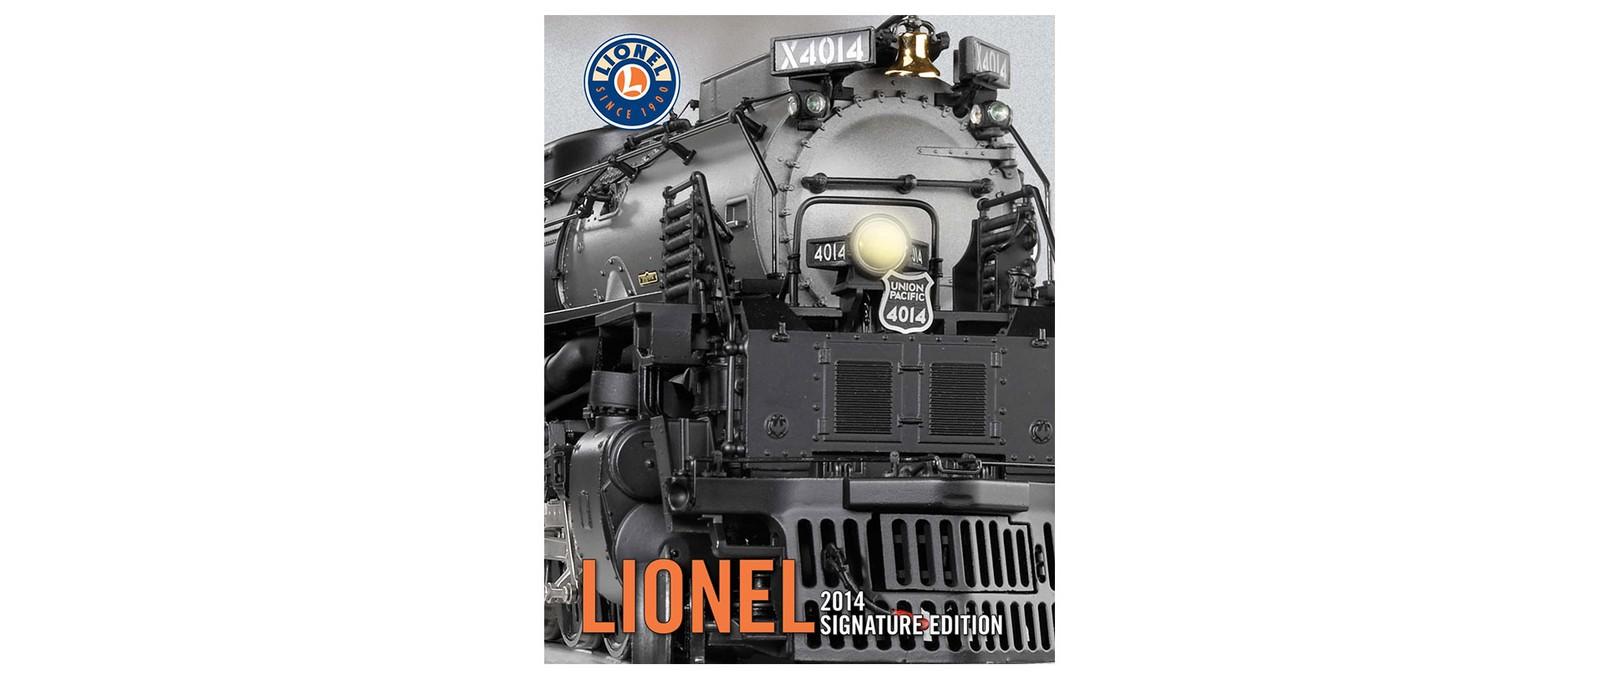 Lionel 2014 Signature Edition Catalog Product List